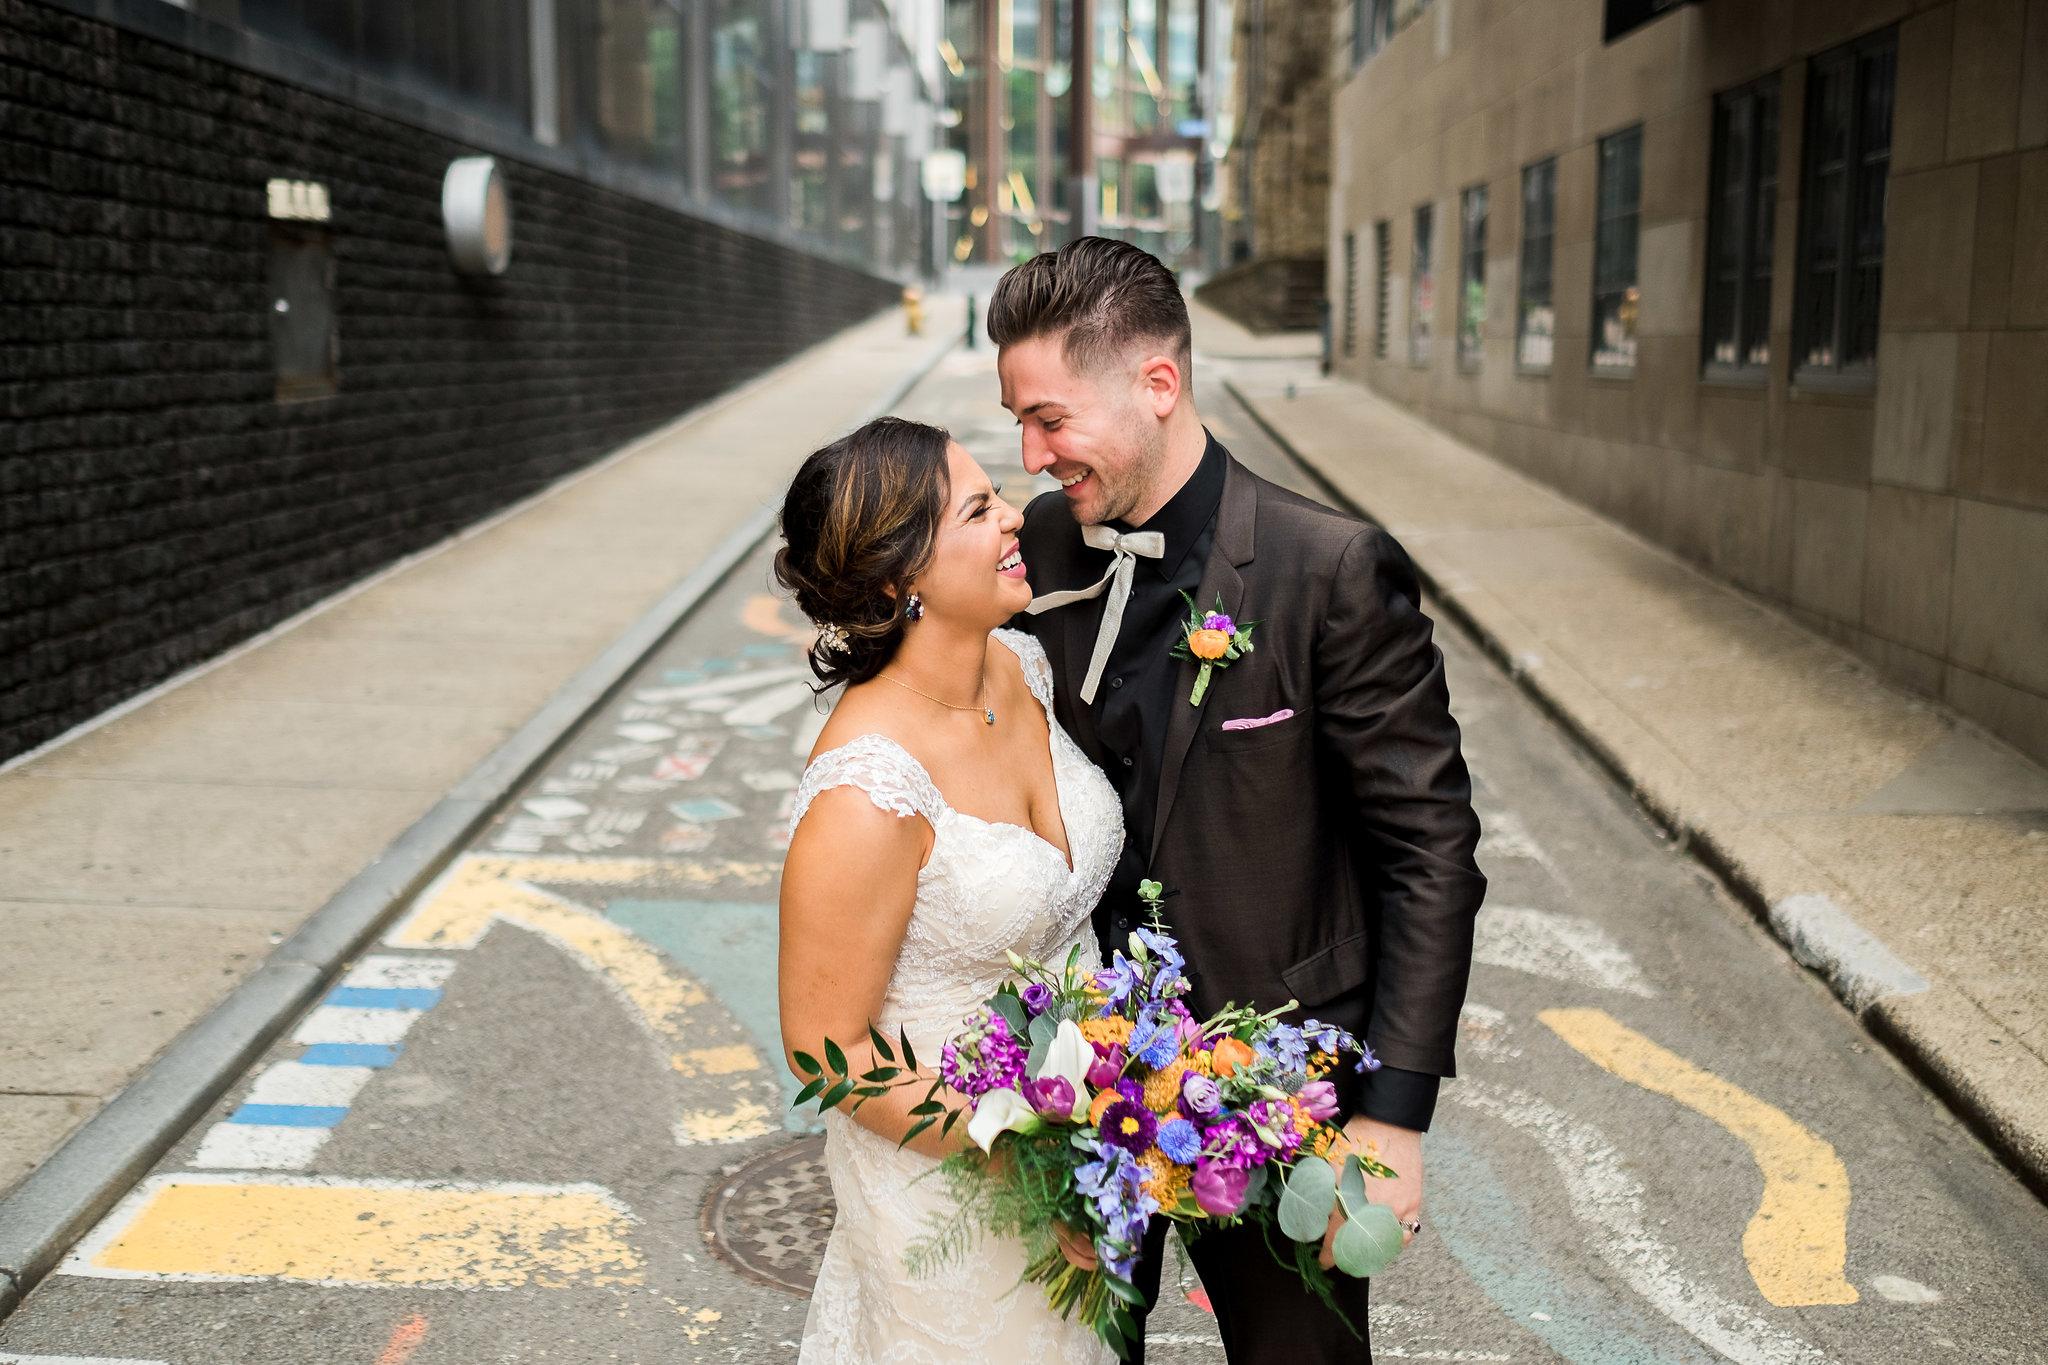 Bride and groom's pittsburgh wedding